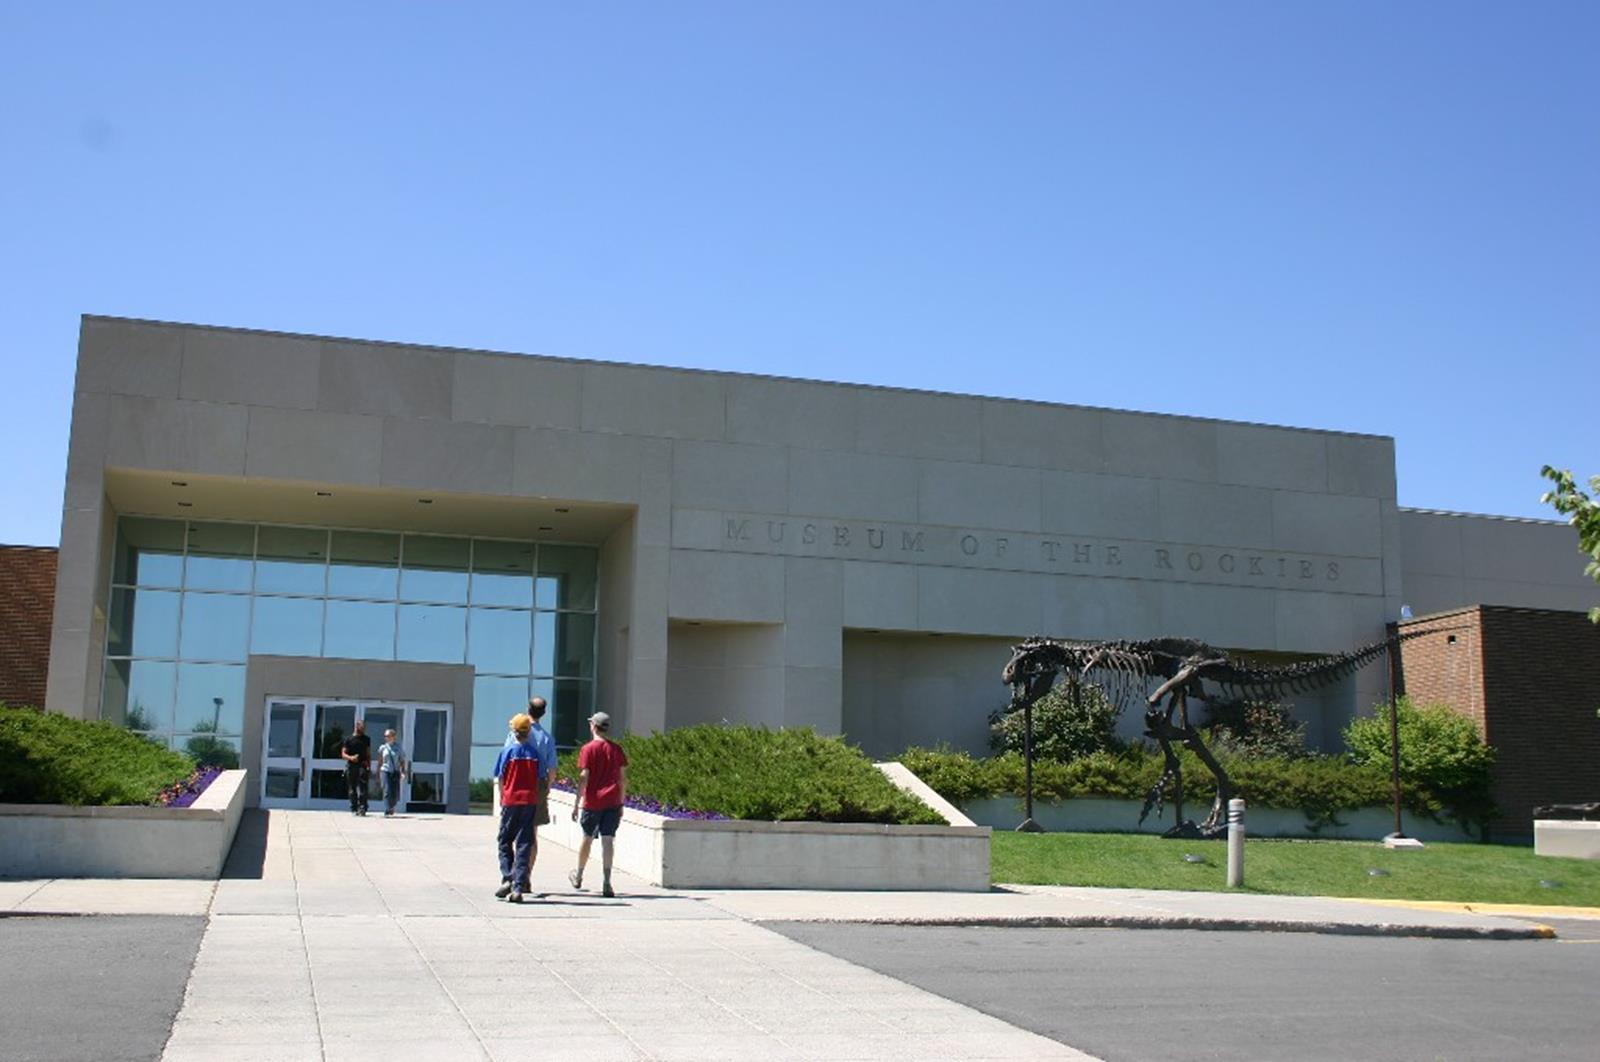 Museum of the Rockies. Credit jllm06 at en.wikipedia